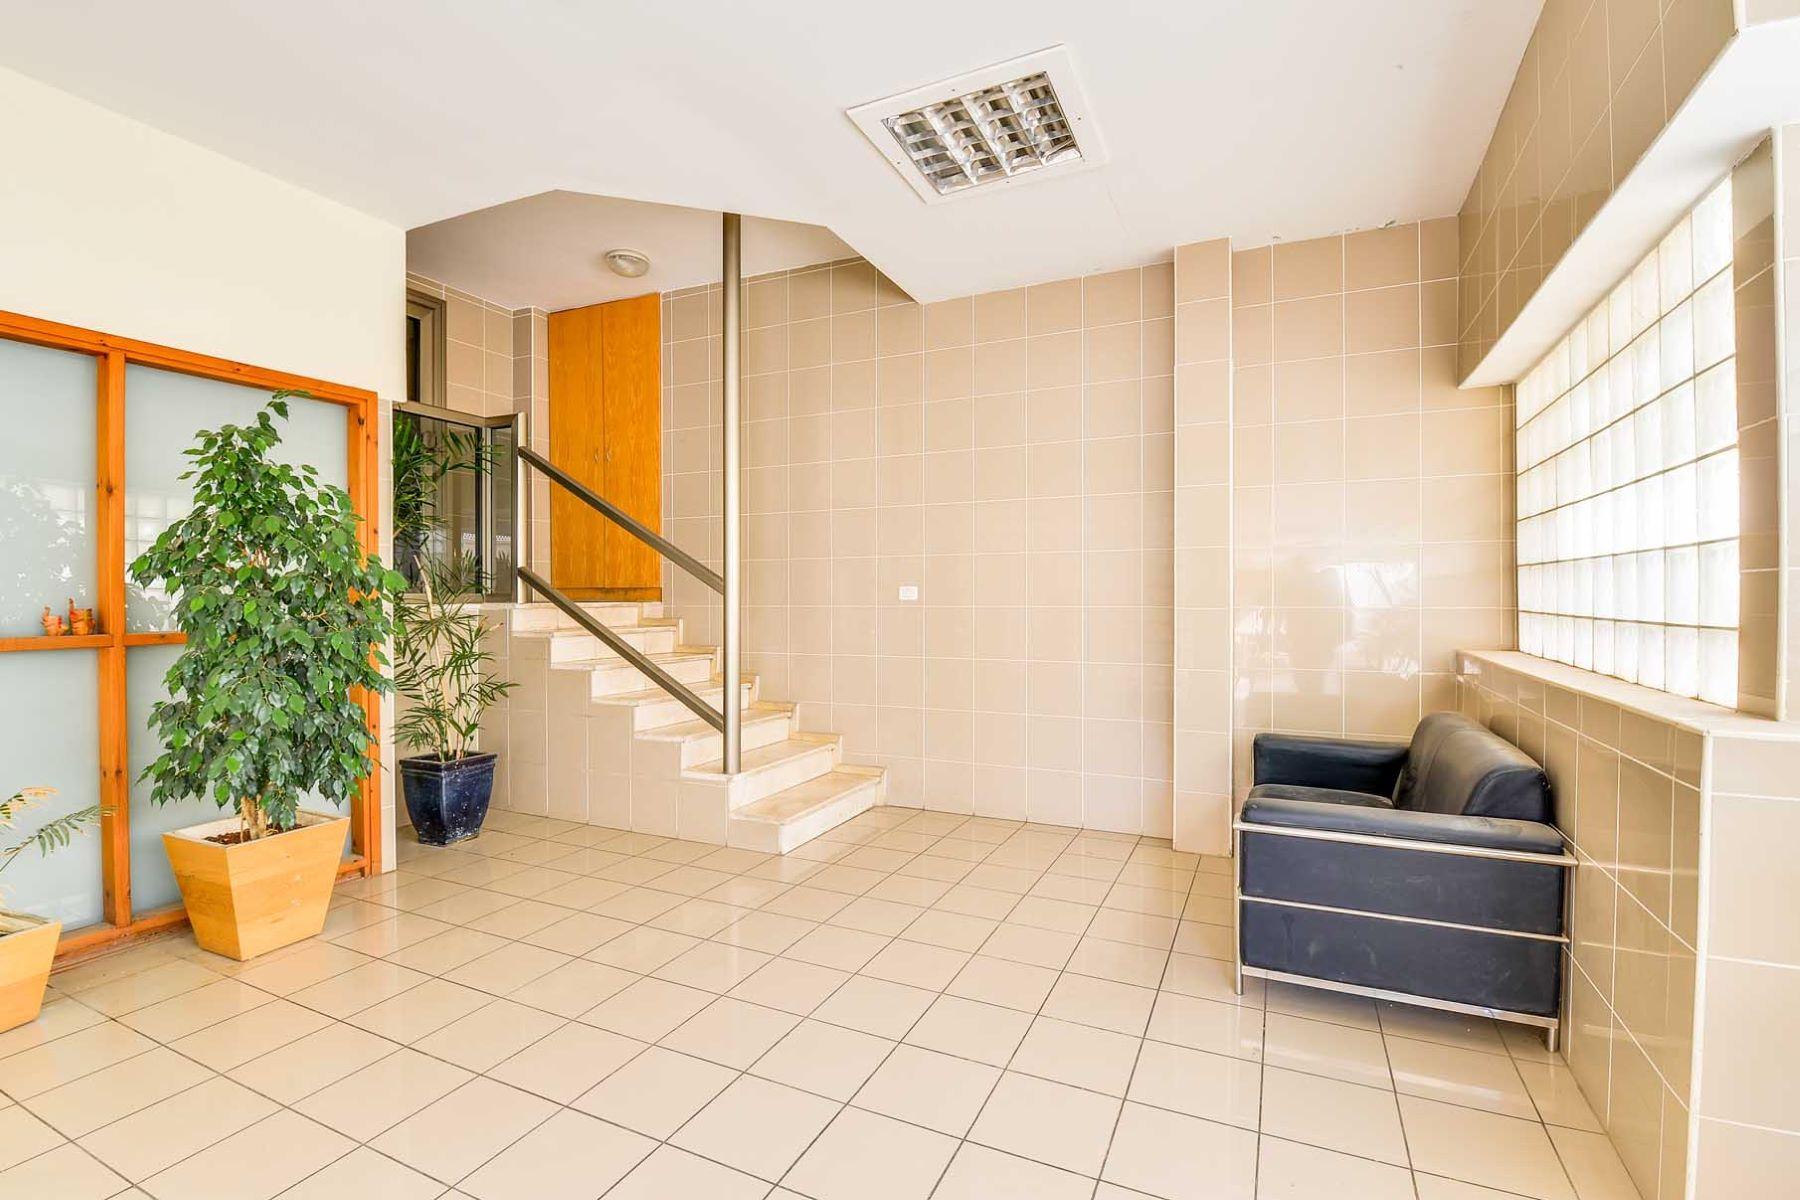 Additional photo for property listing at Elegant Garden Apartment in Ramot Tsahala Tel Aviv, Israel Israel